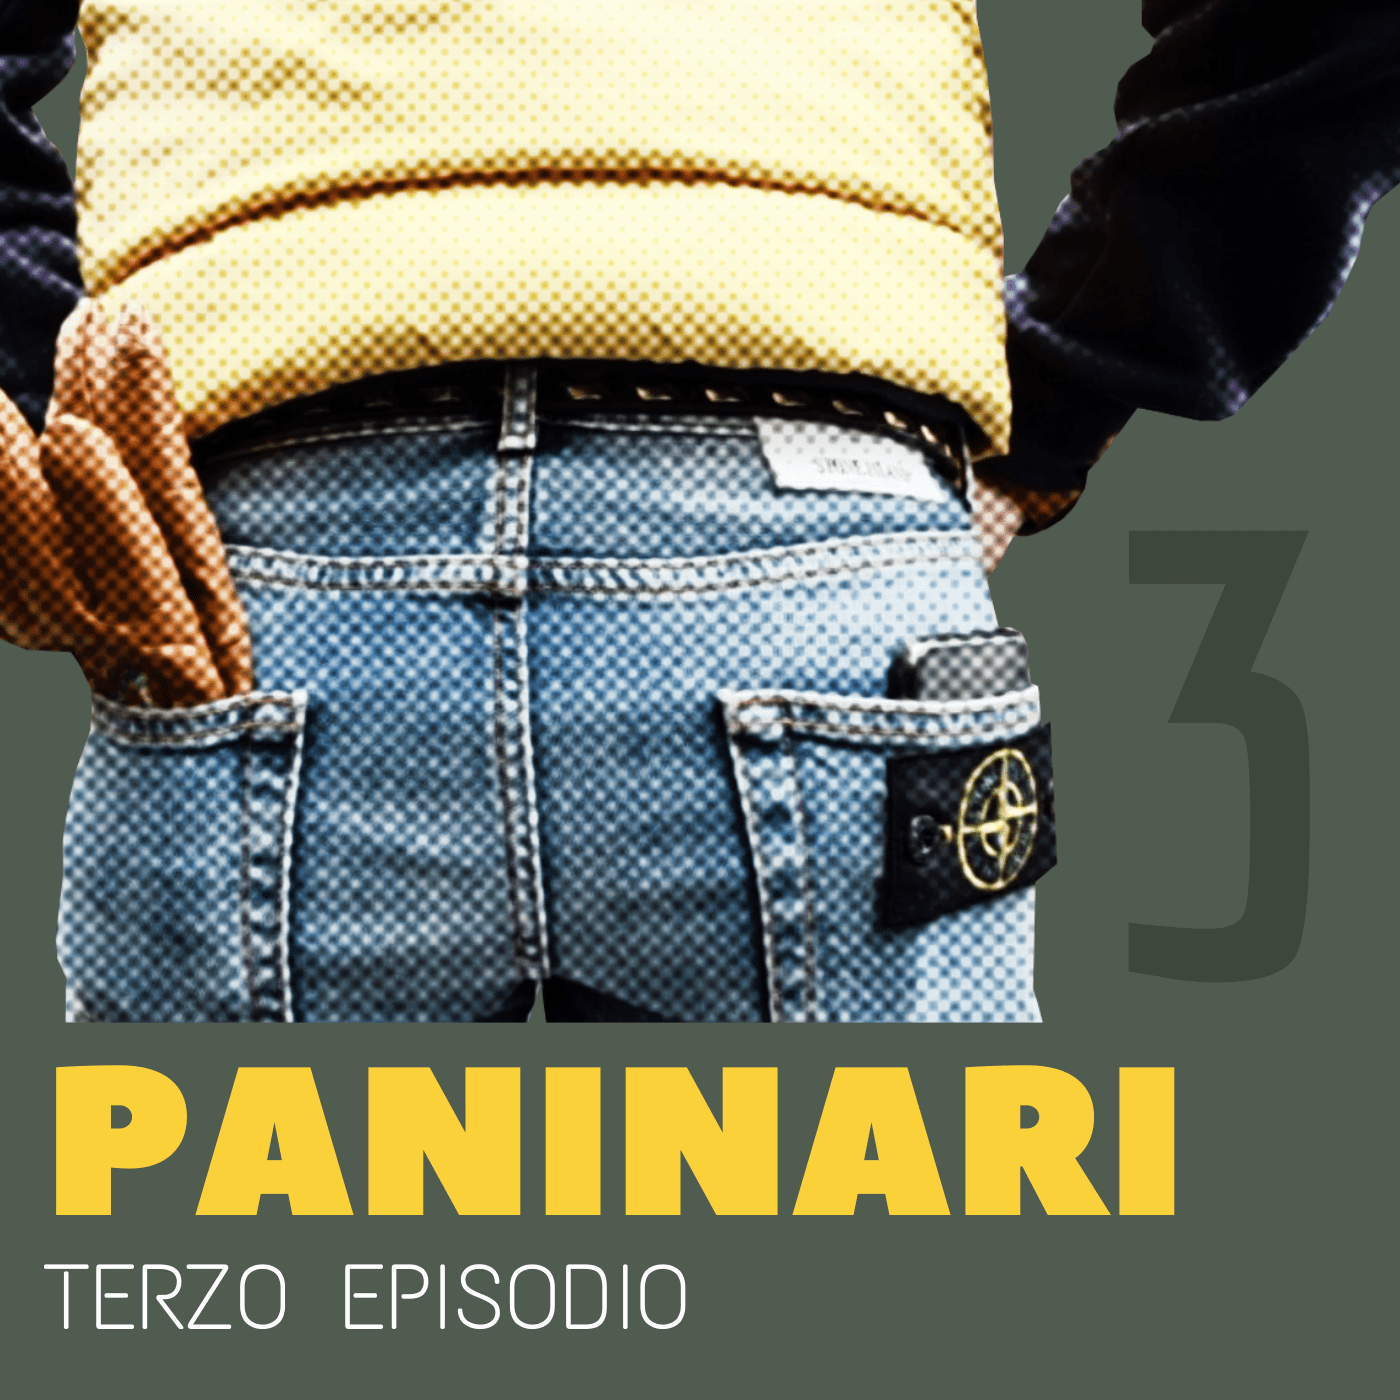 Paninari Podcast episodio zero